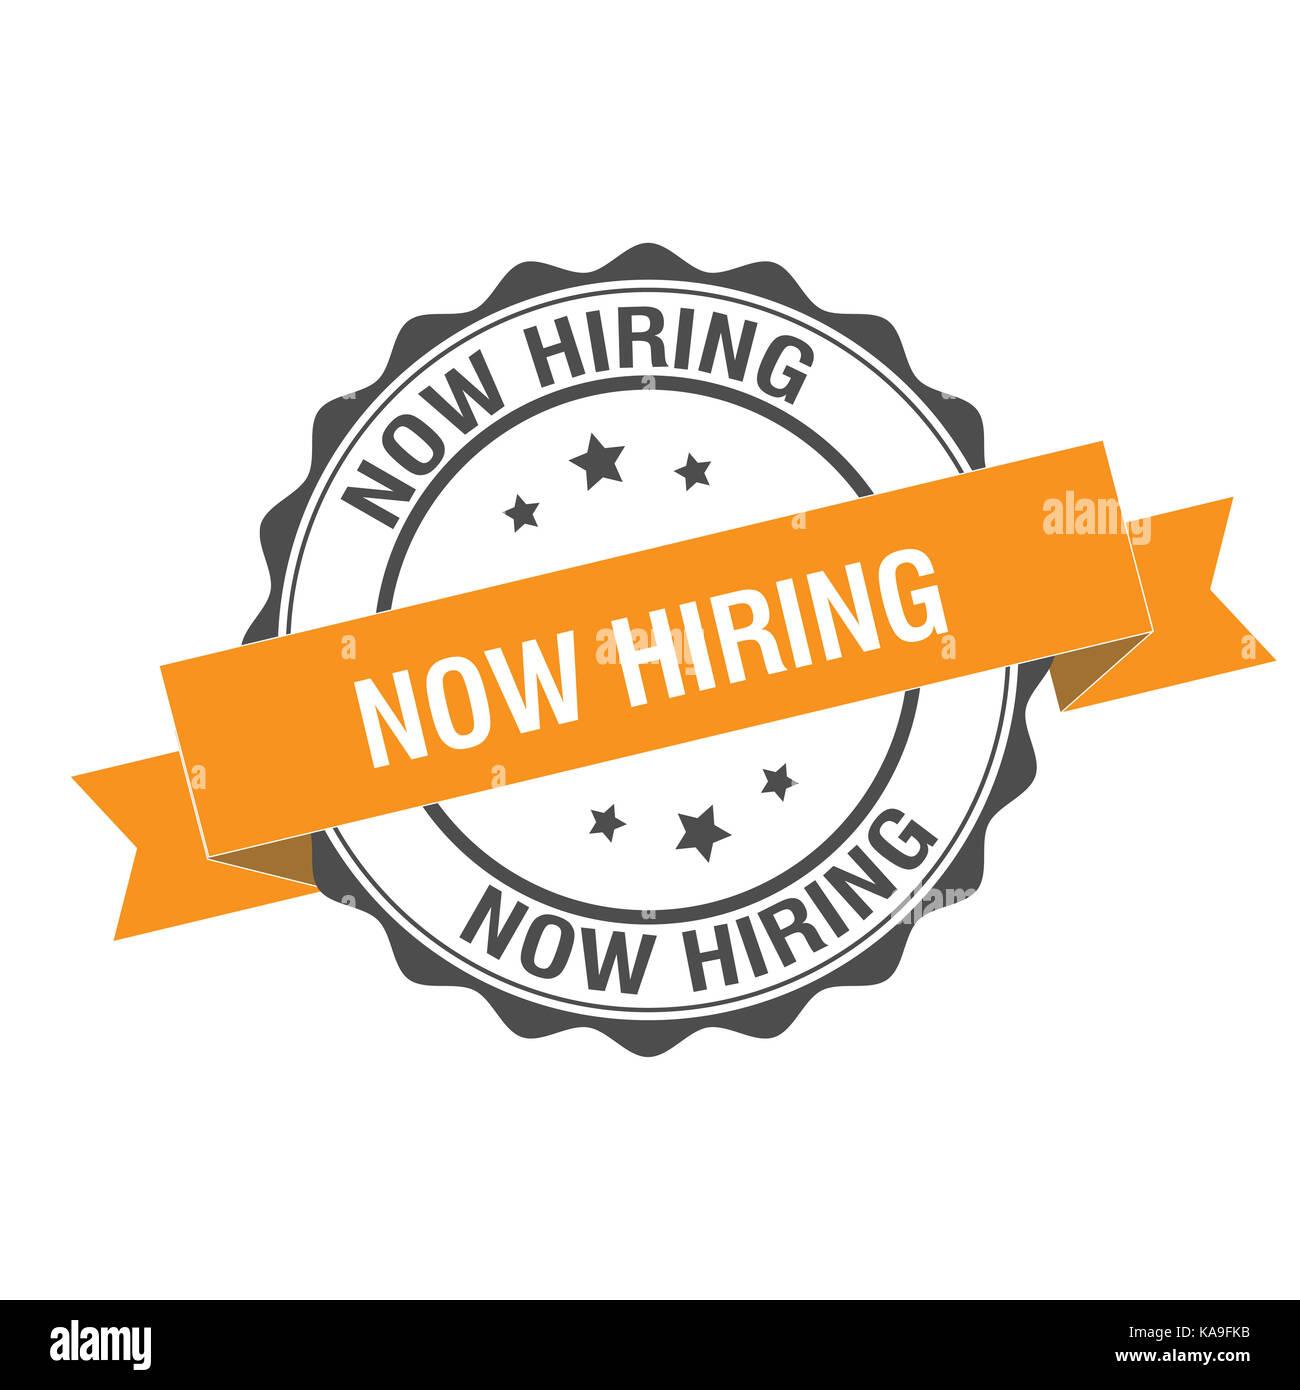 Now hiring stamp illustration - Stock Image